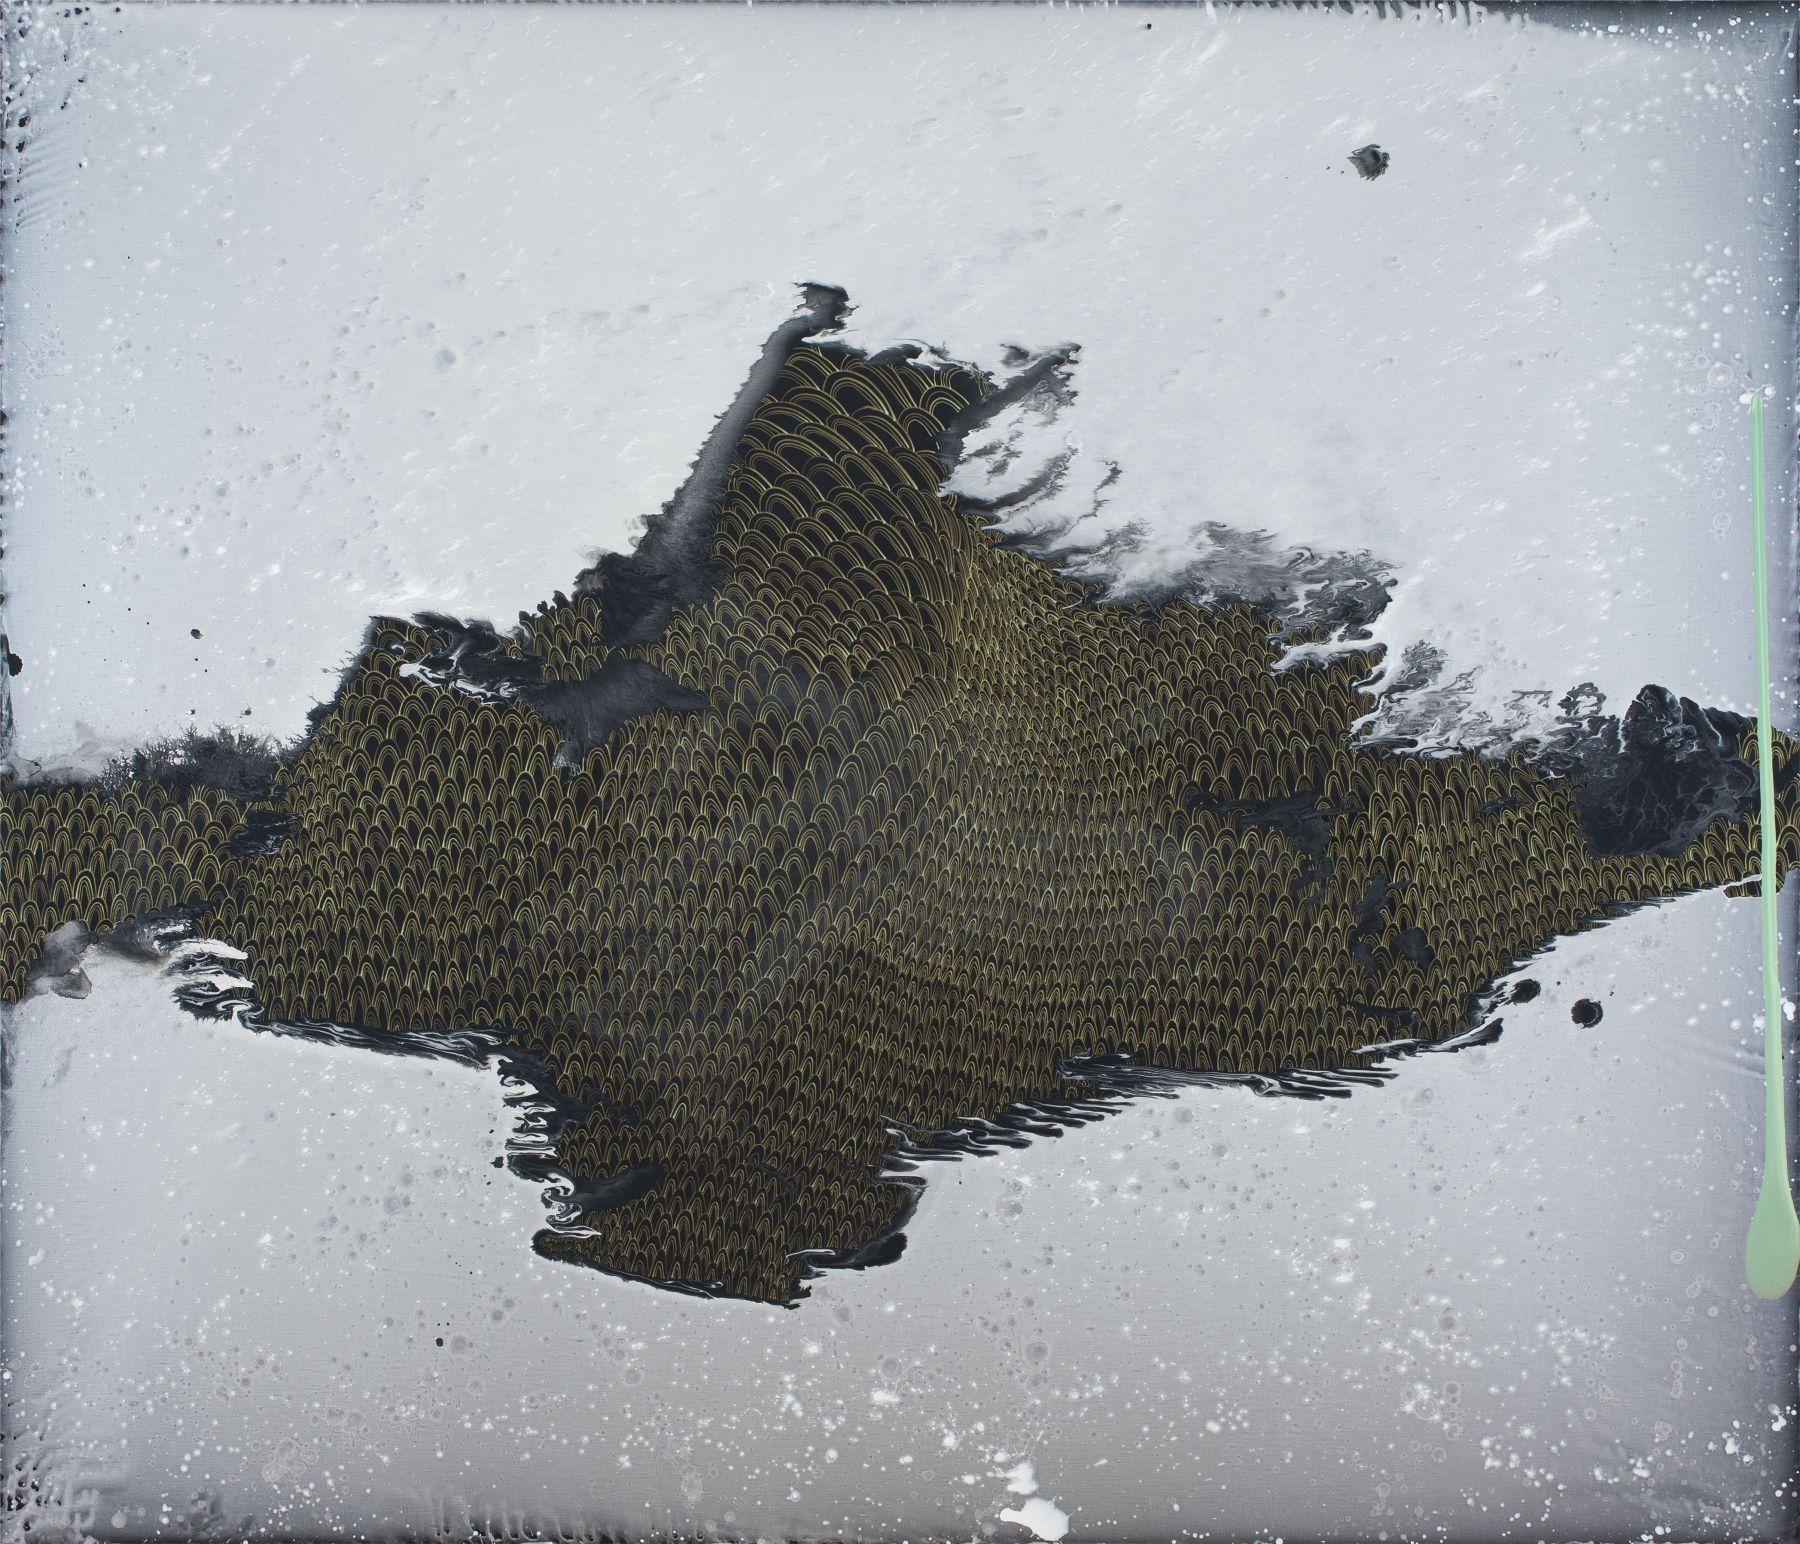 Aeaea, 2018, Acrylic on linen